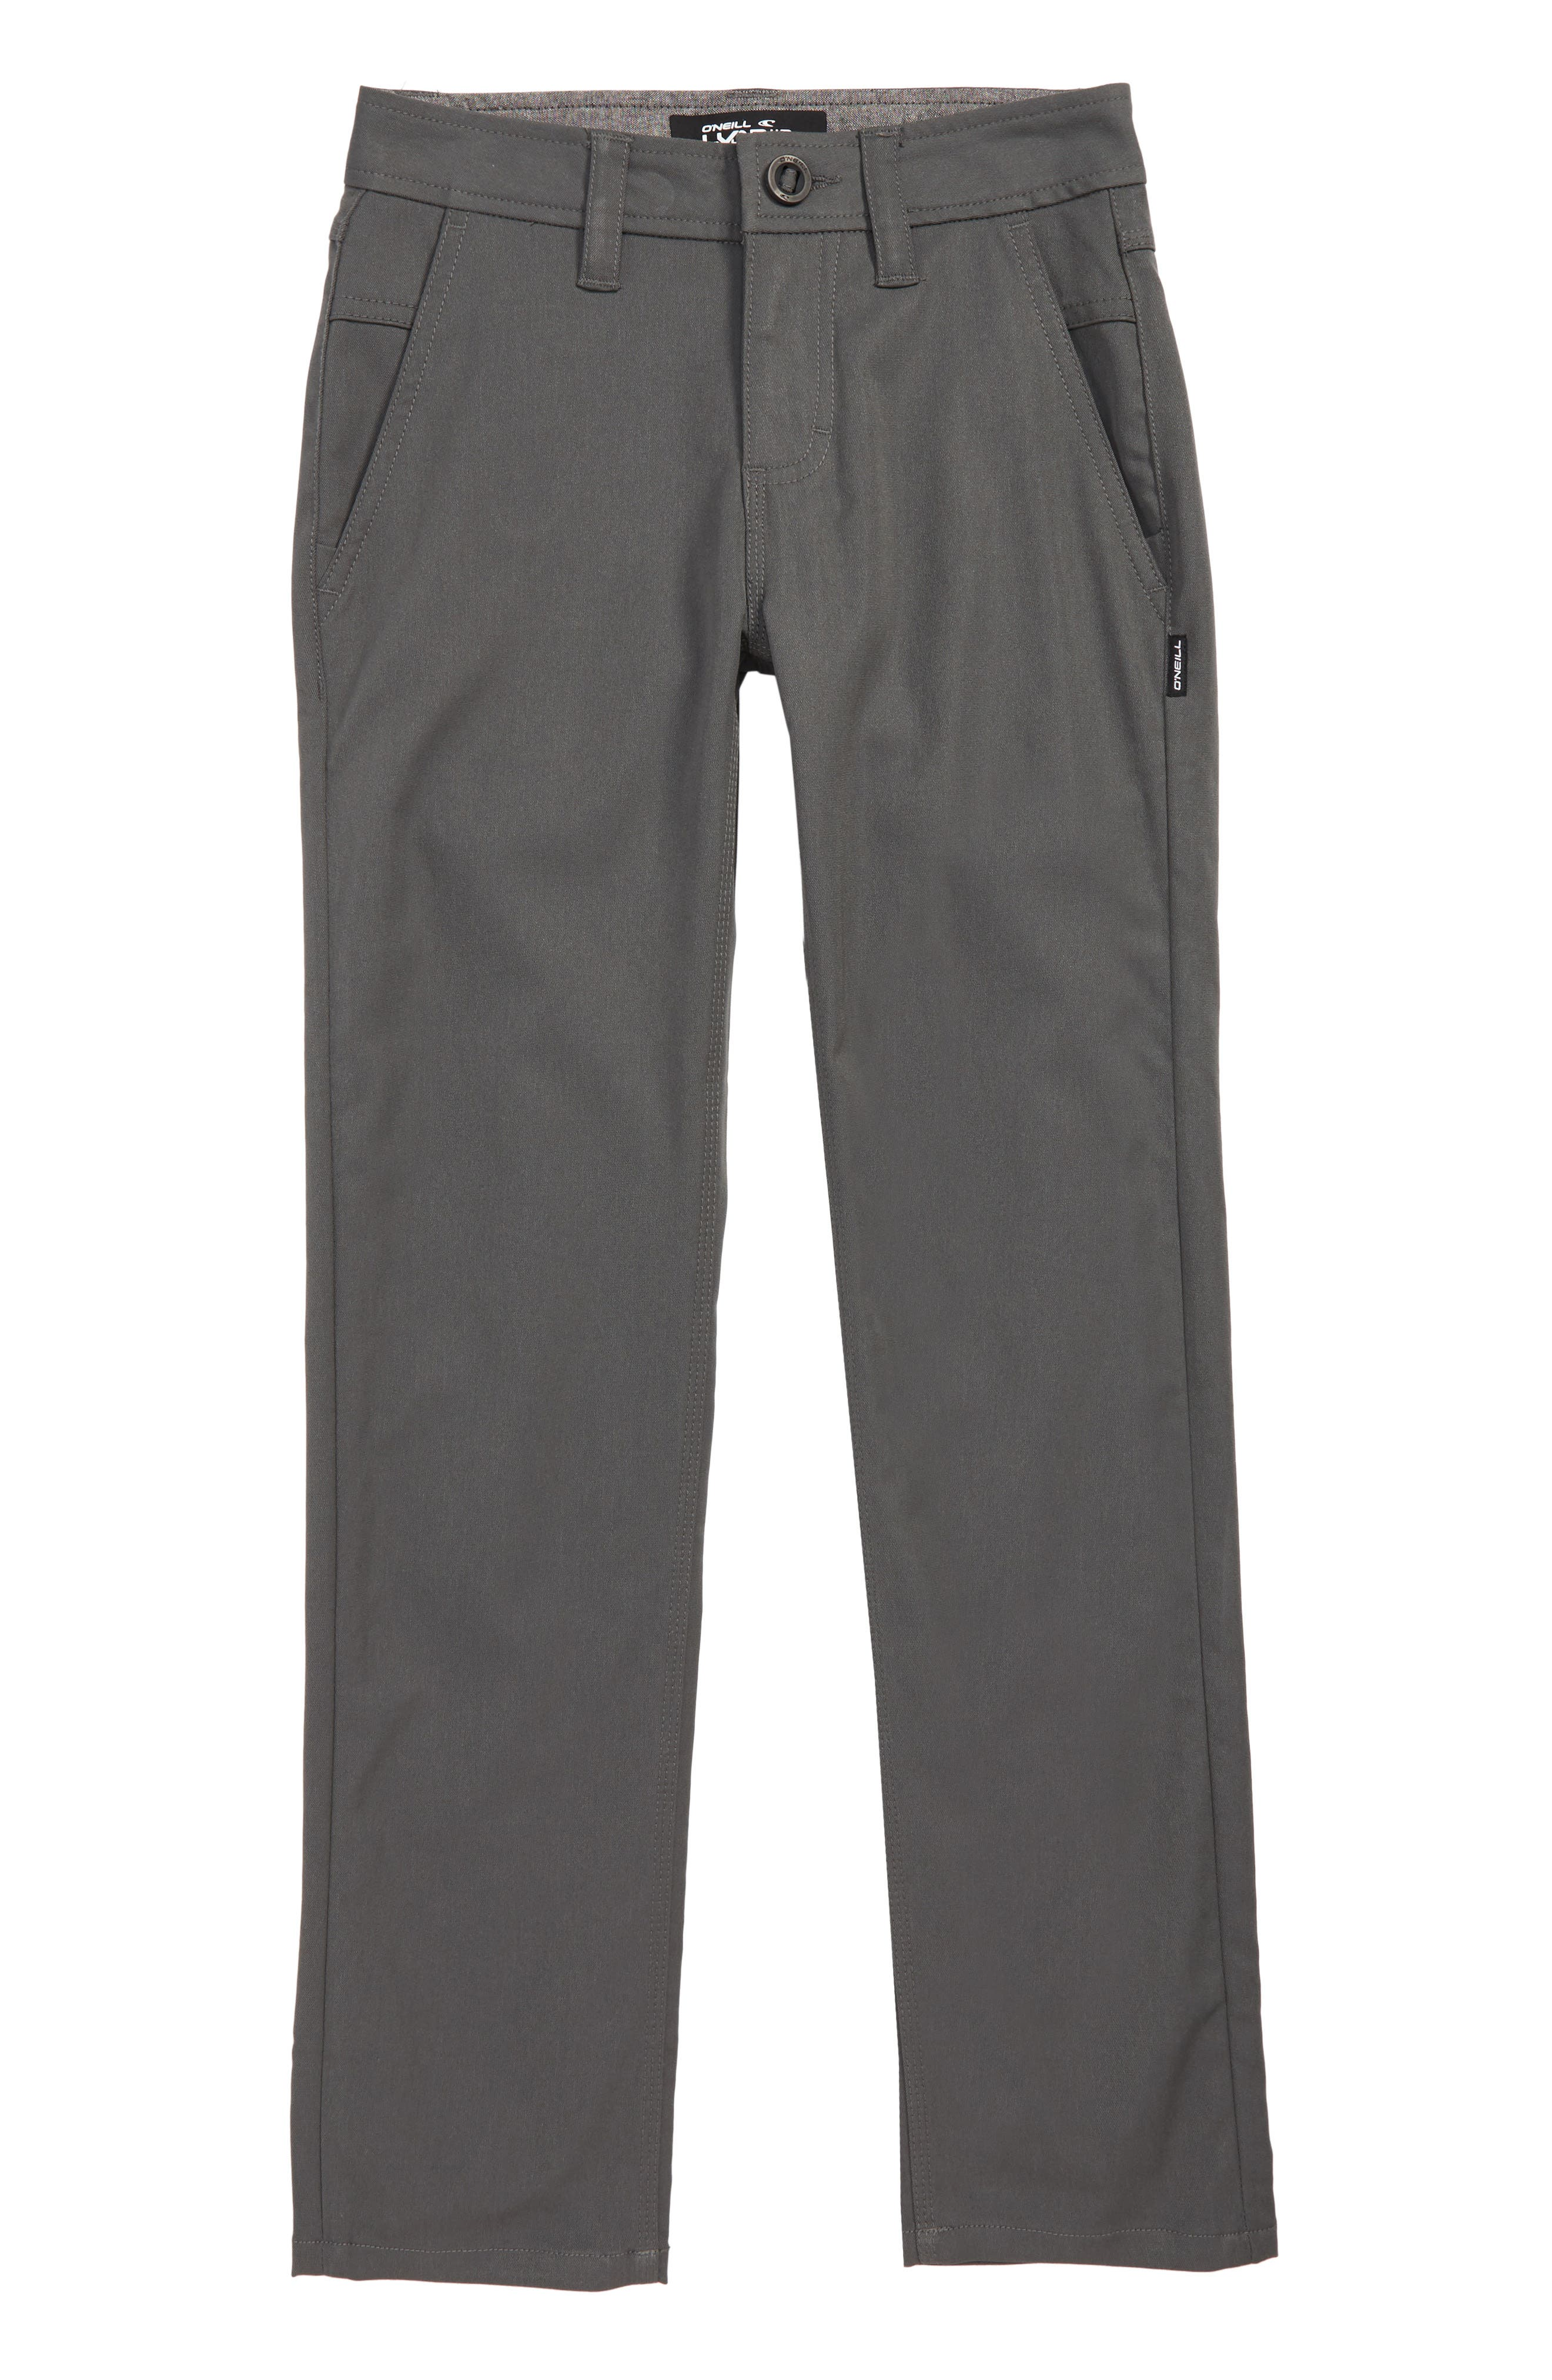 Redlands Hybrid Pants,                             Main thumbnail 1, color,                             020